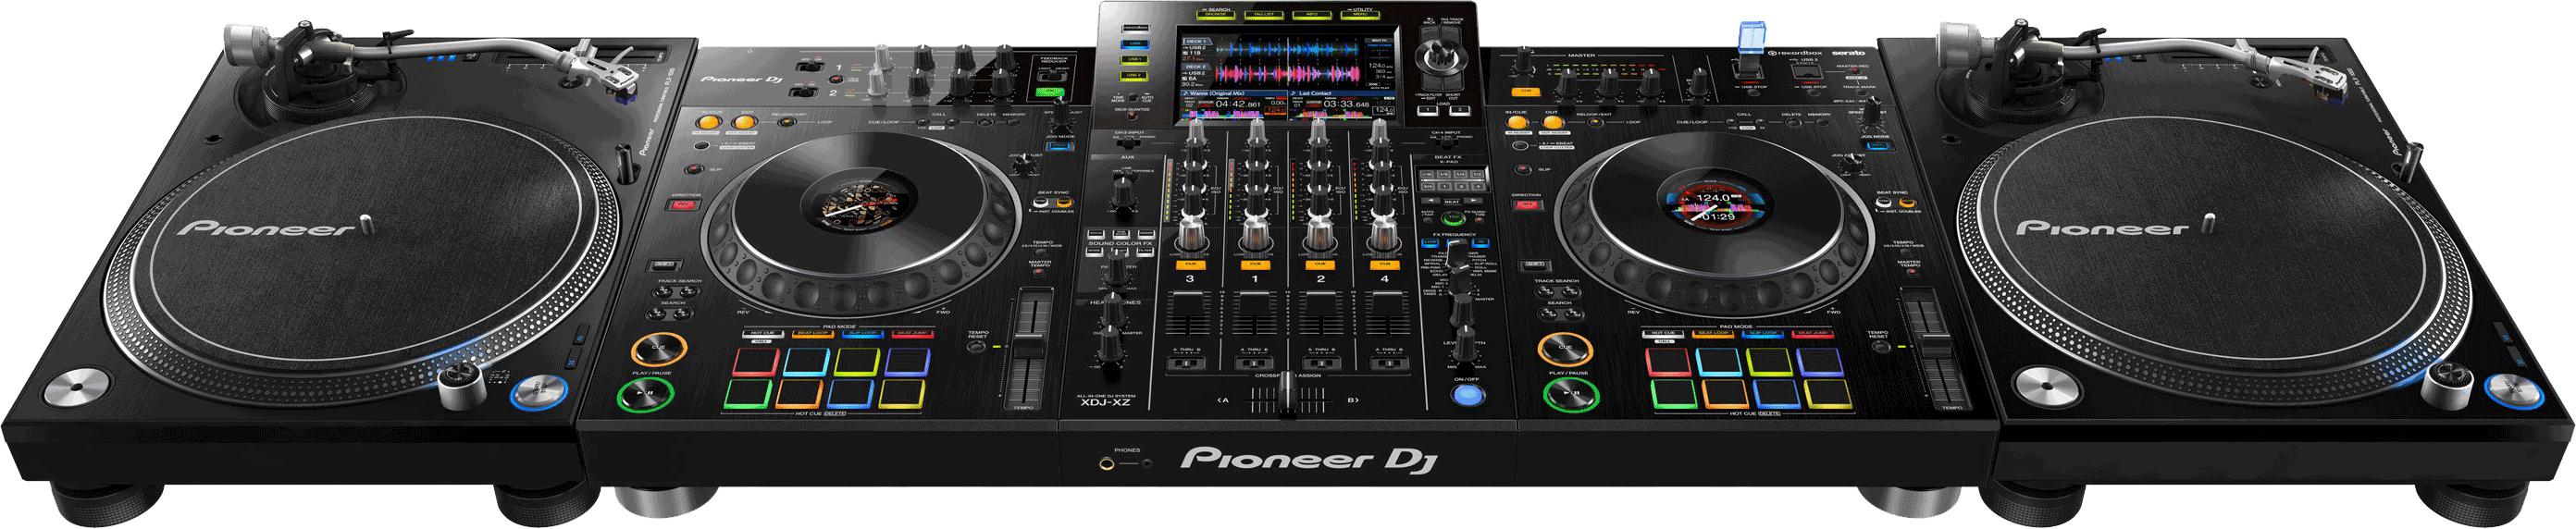 Pioneer XDJ-XZ mit Plattenspielern.